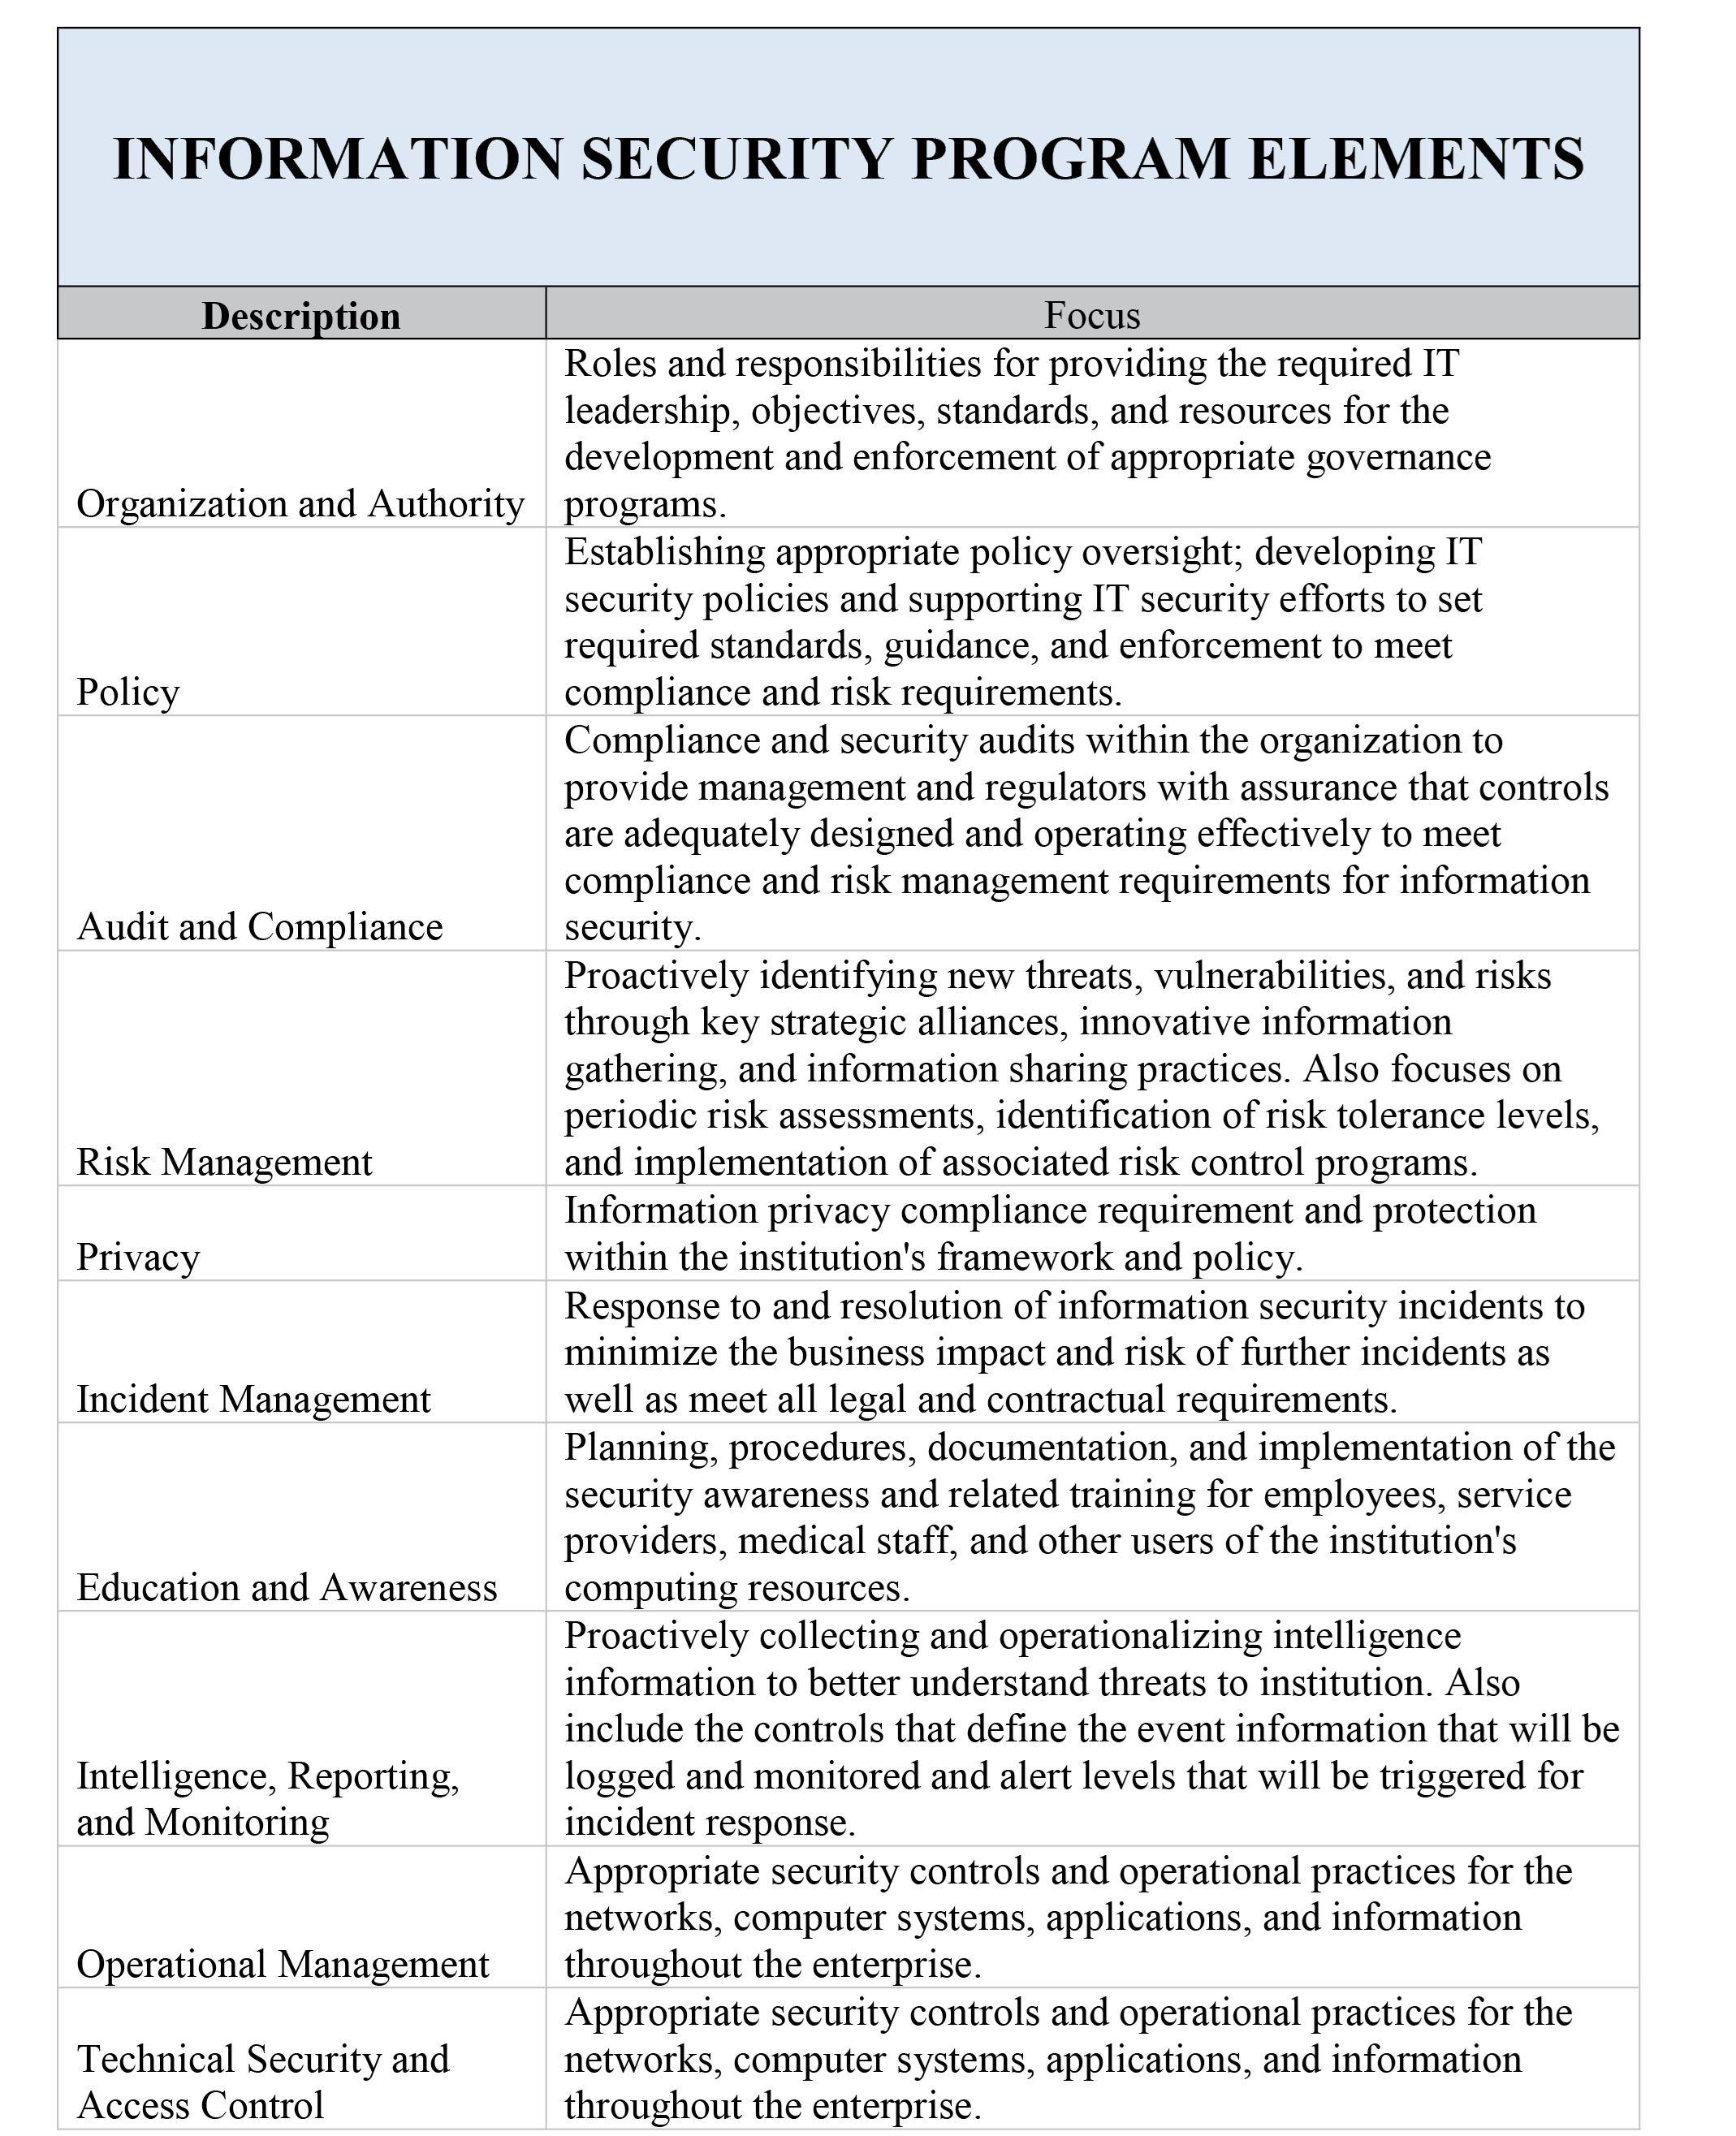 information security program elements